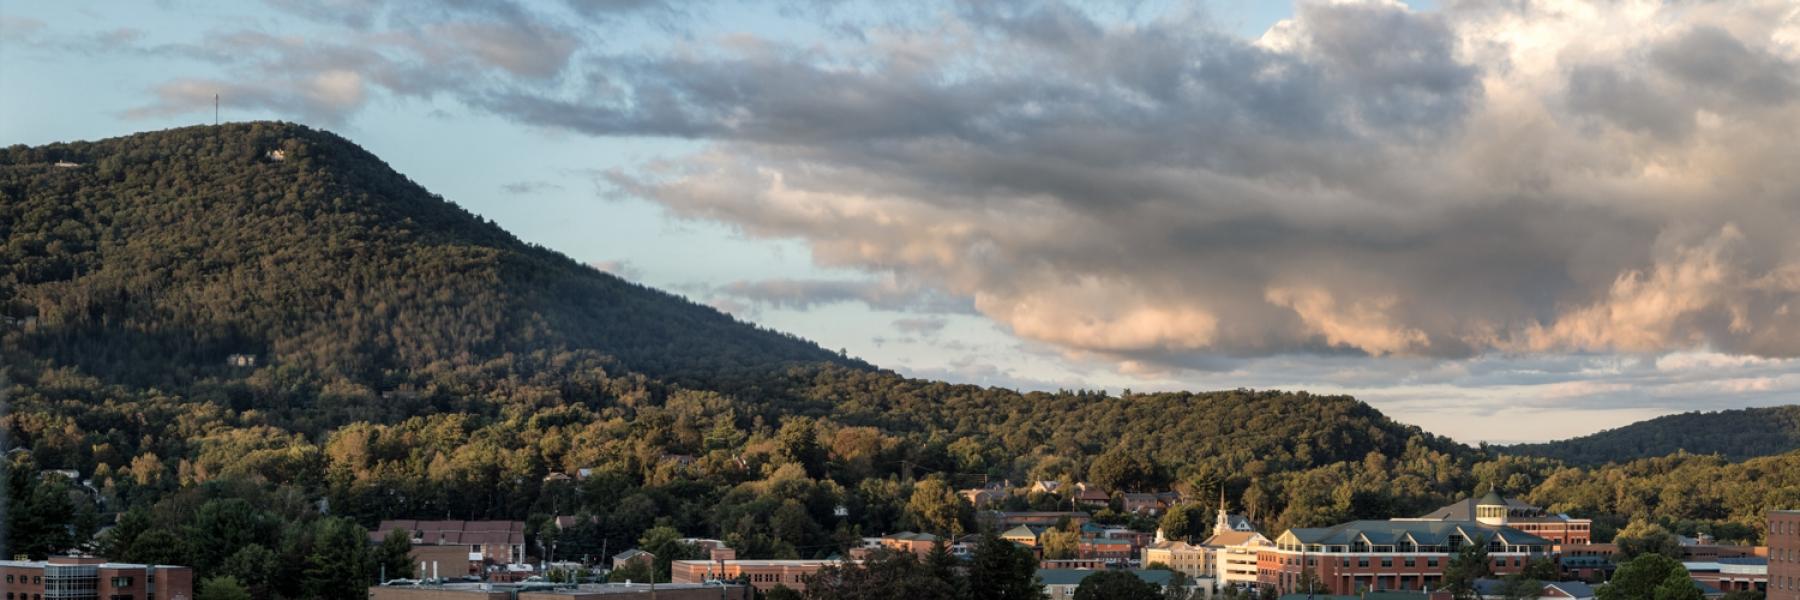 Image, Campus at Dusk 2